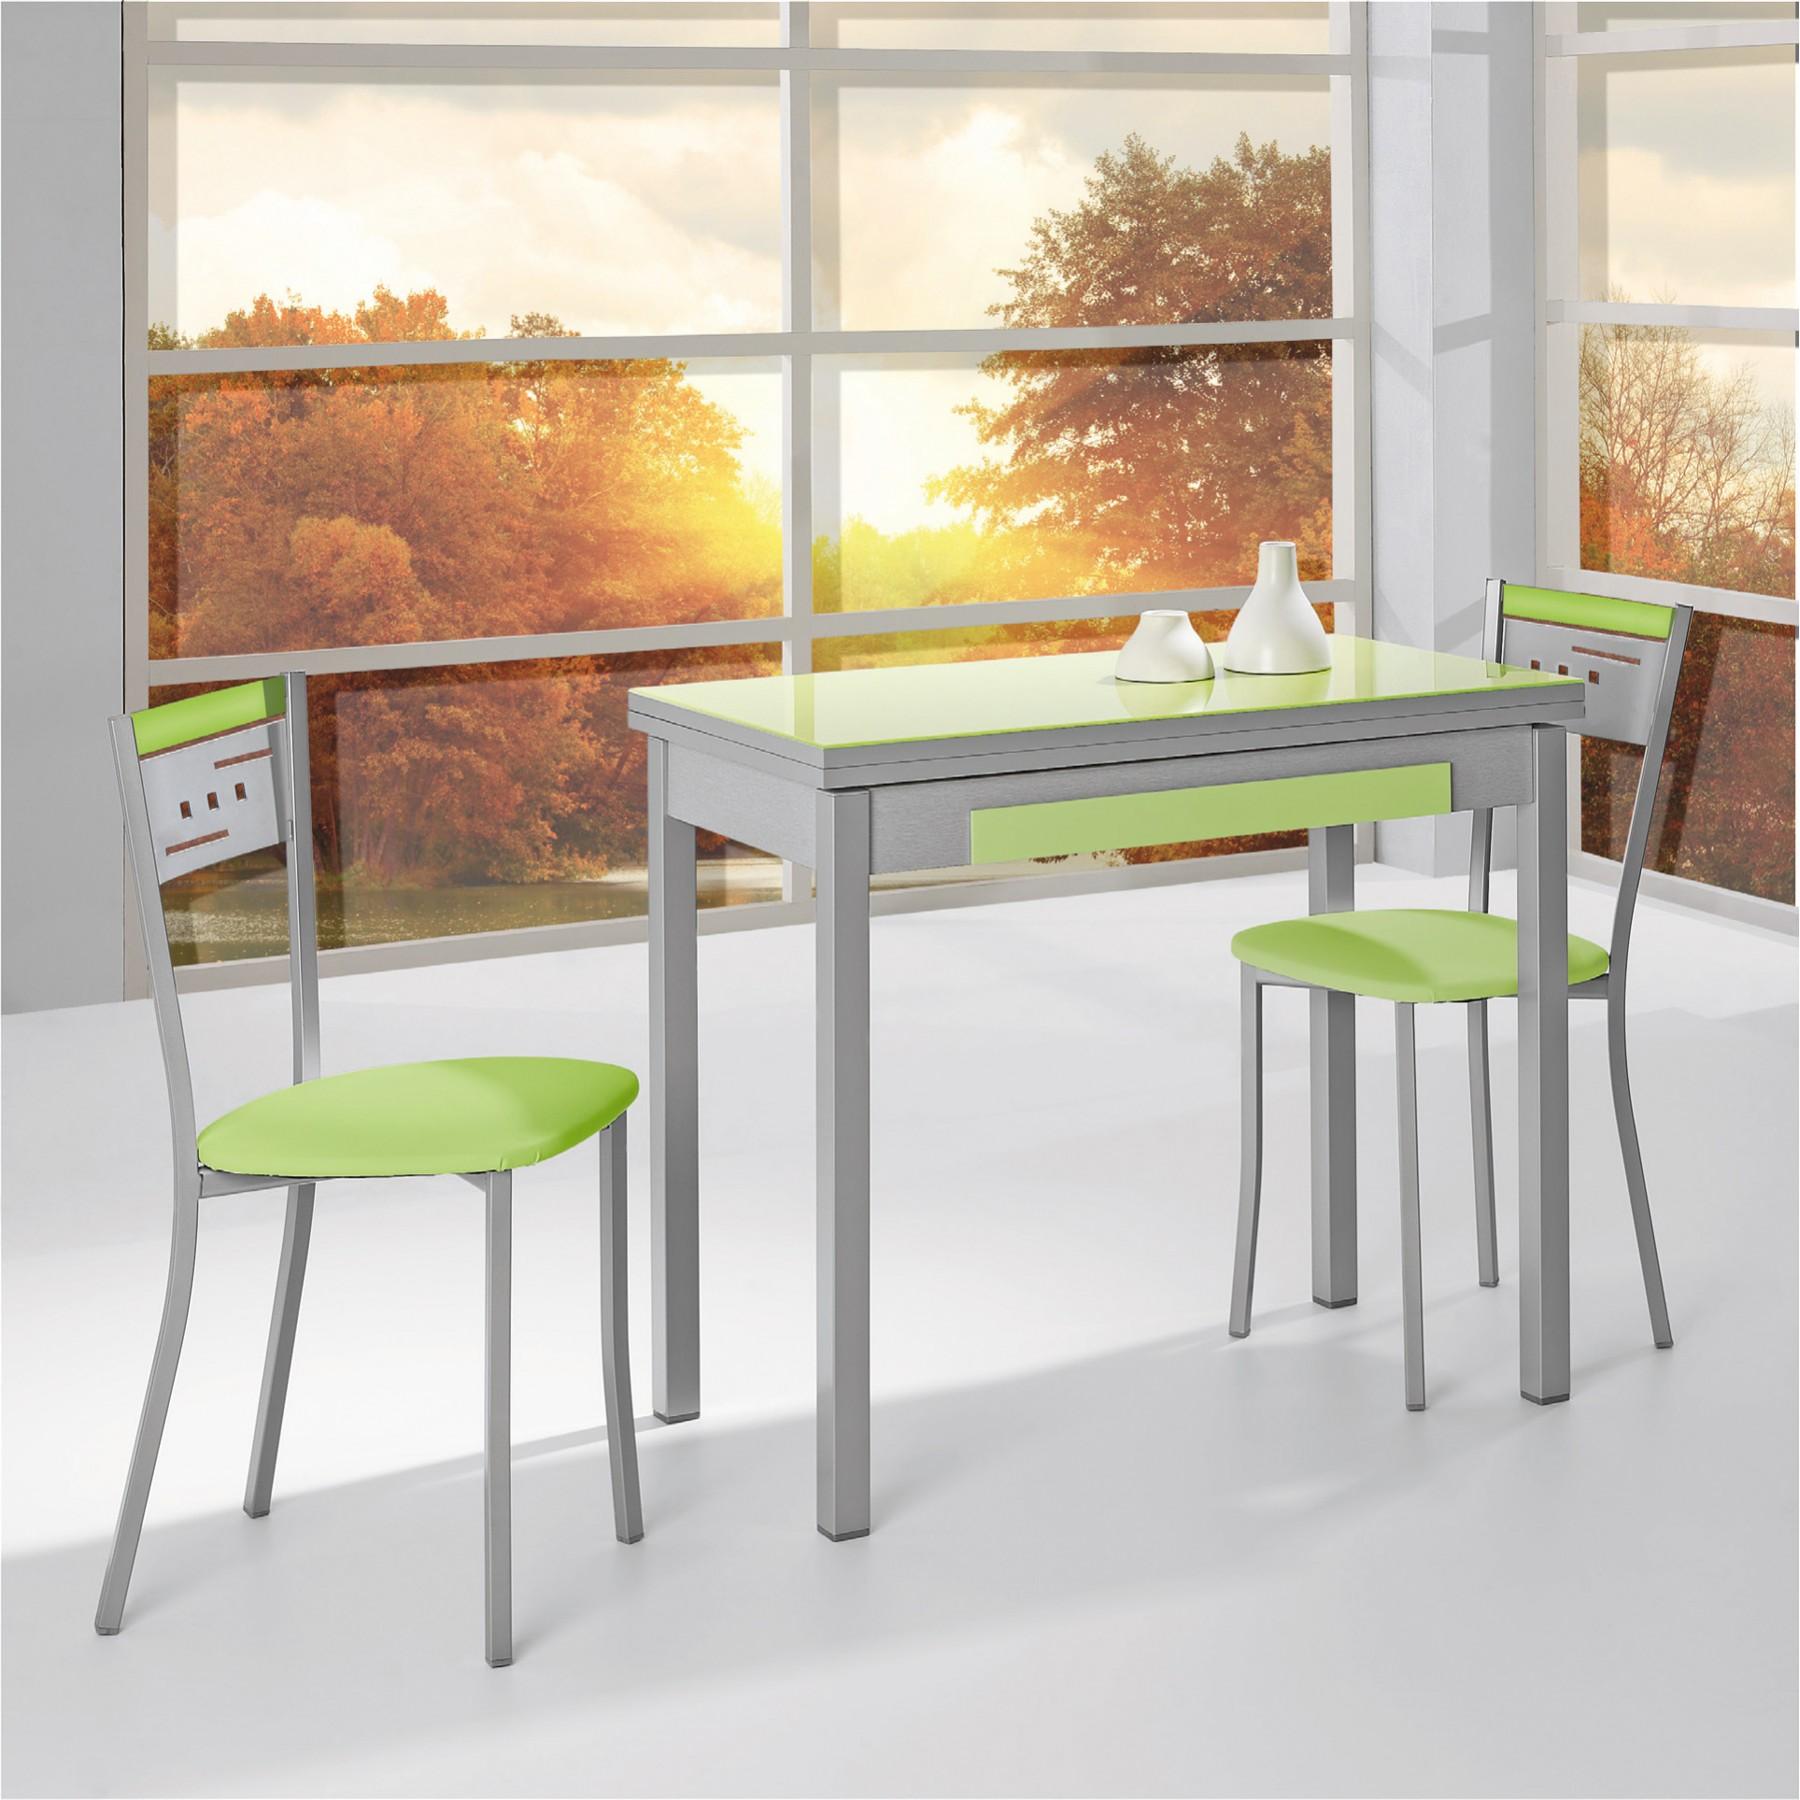 Conjunto de mesa libro y sillas de cocina modelo sunny - Mesas libro cocina ...